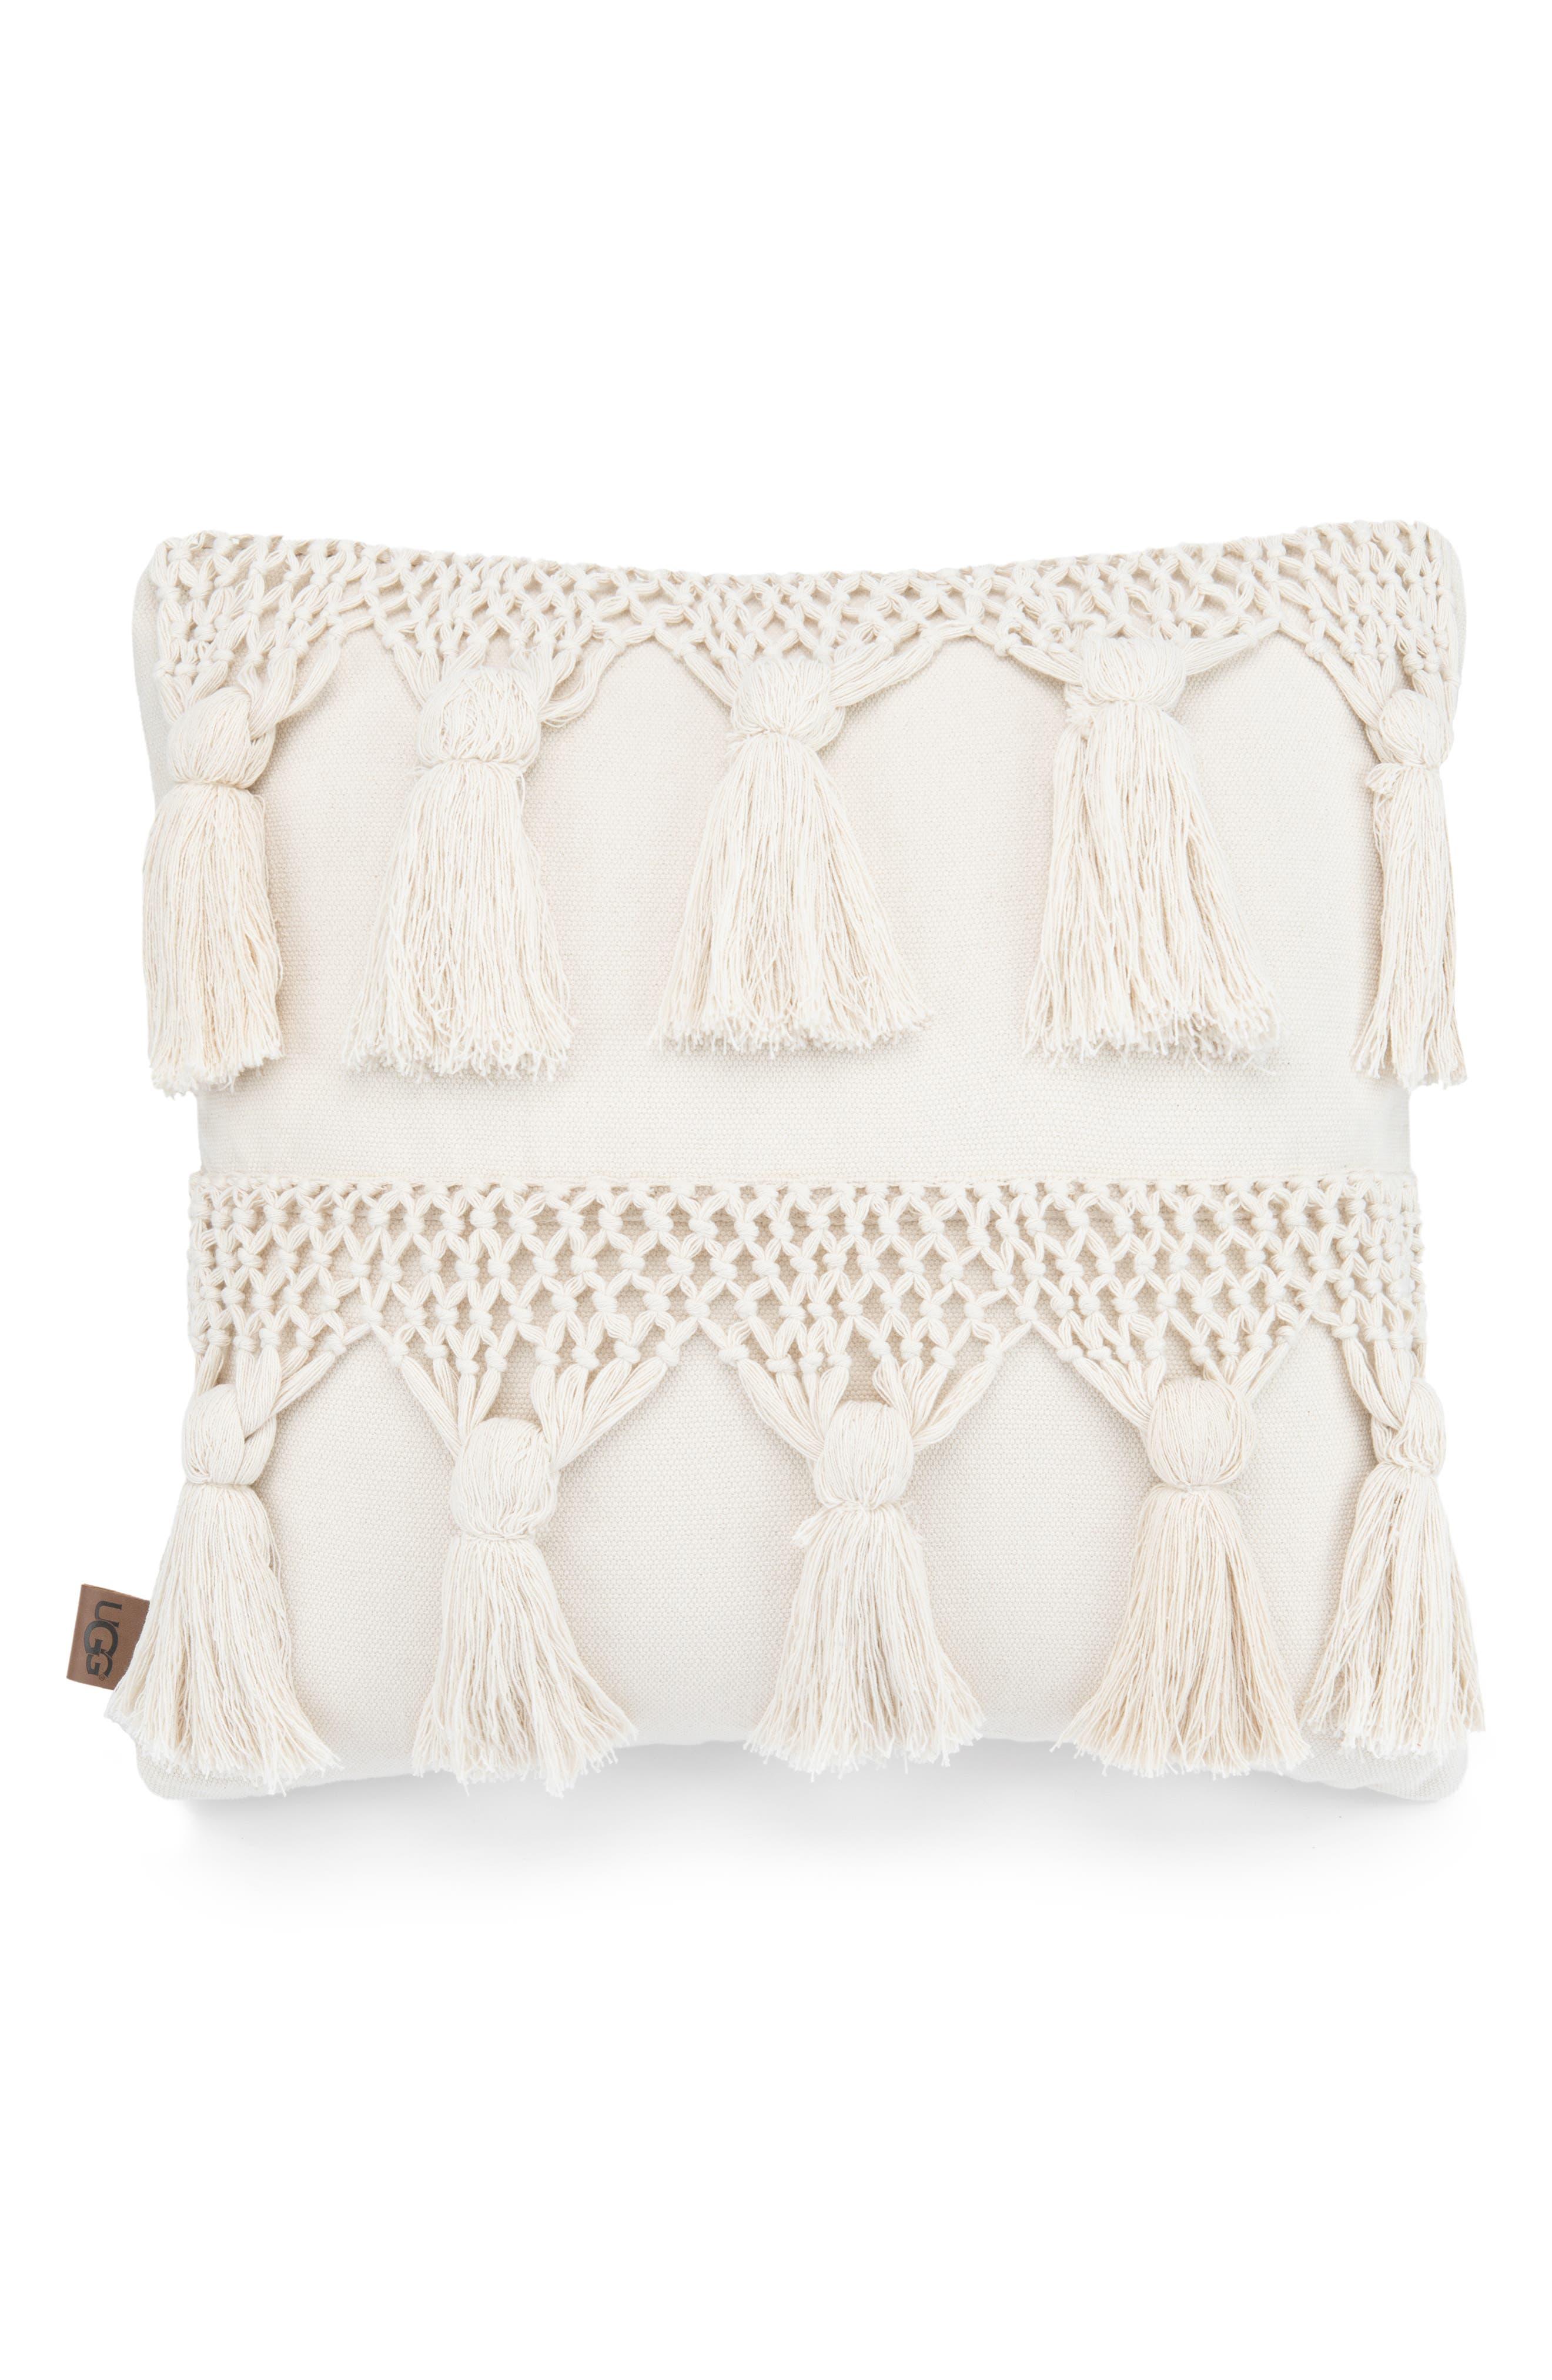 UGG<SUP>®</SUP> Playa Tassel Accent Pillow, Main, color, NATURAL